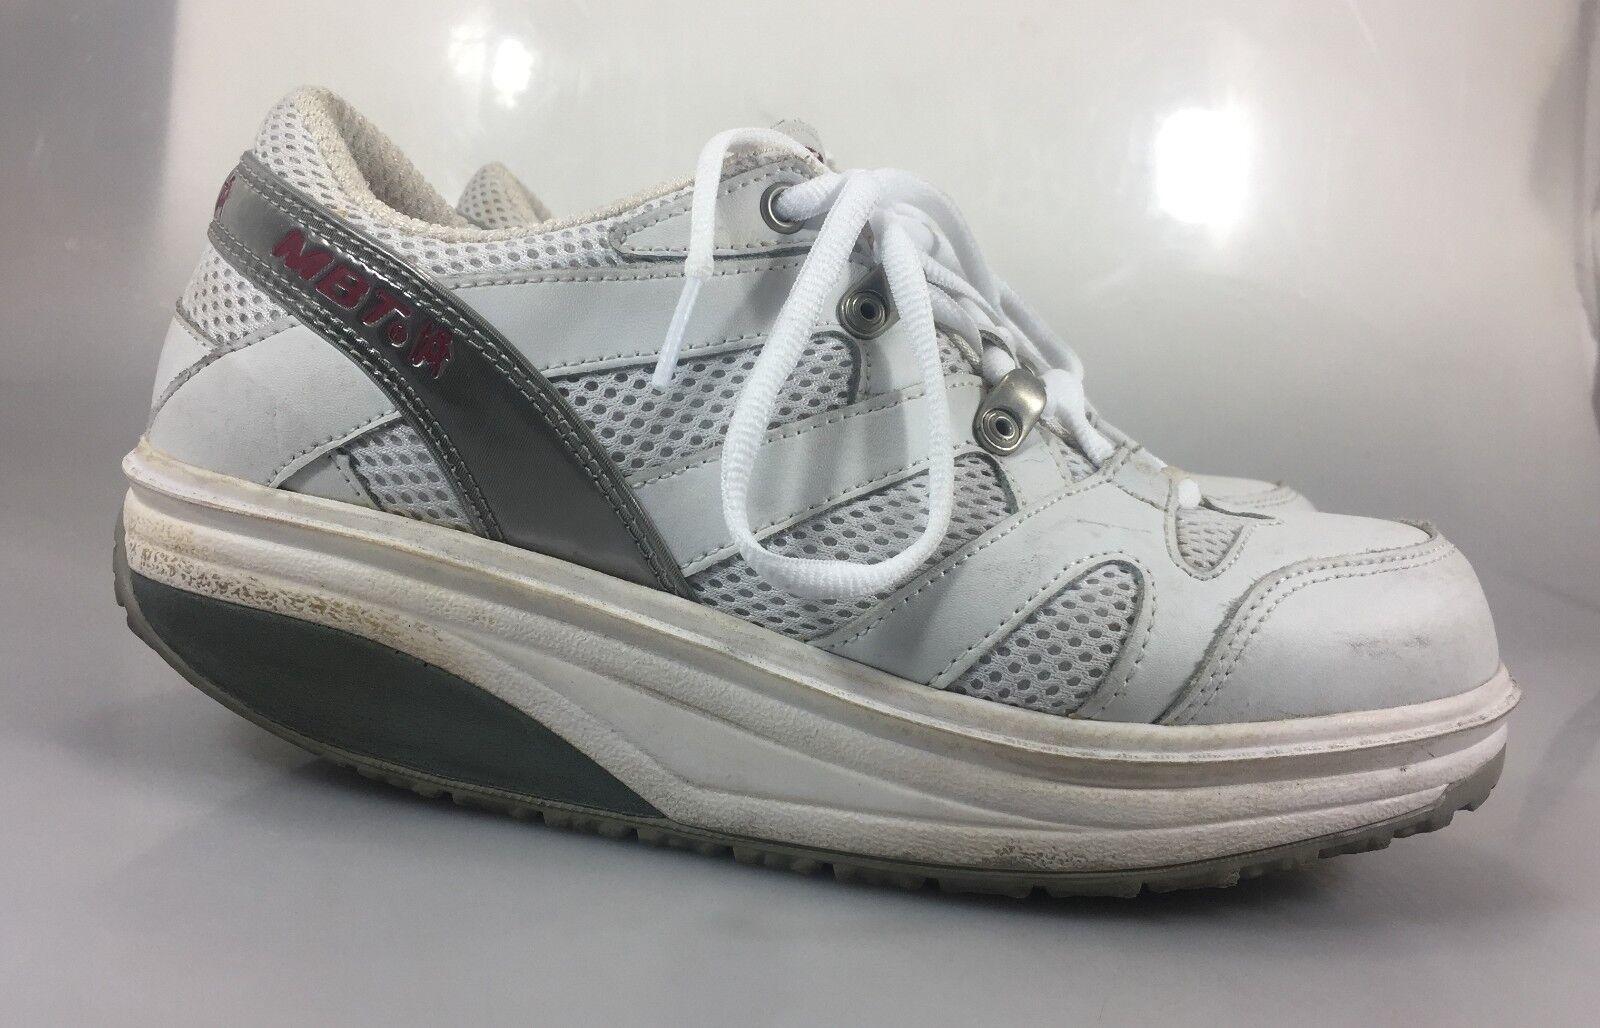 MBT Sport Walking scarpe donna donna donna 7.5 Uomo 5.5 bianca 37 2 3 EU bianca b13dd8